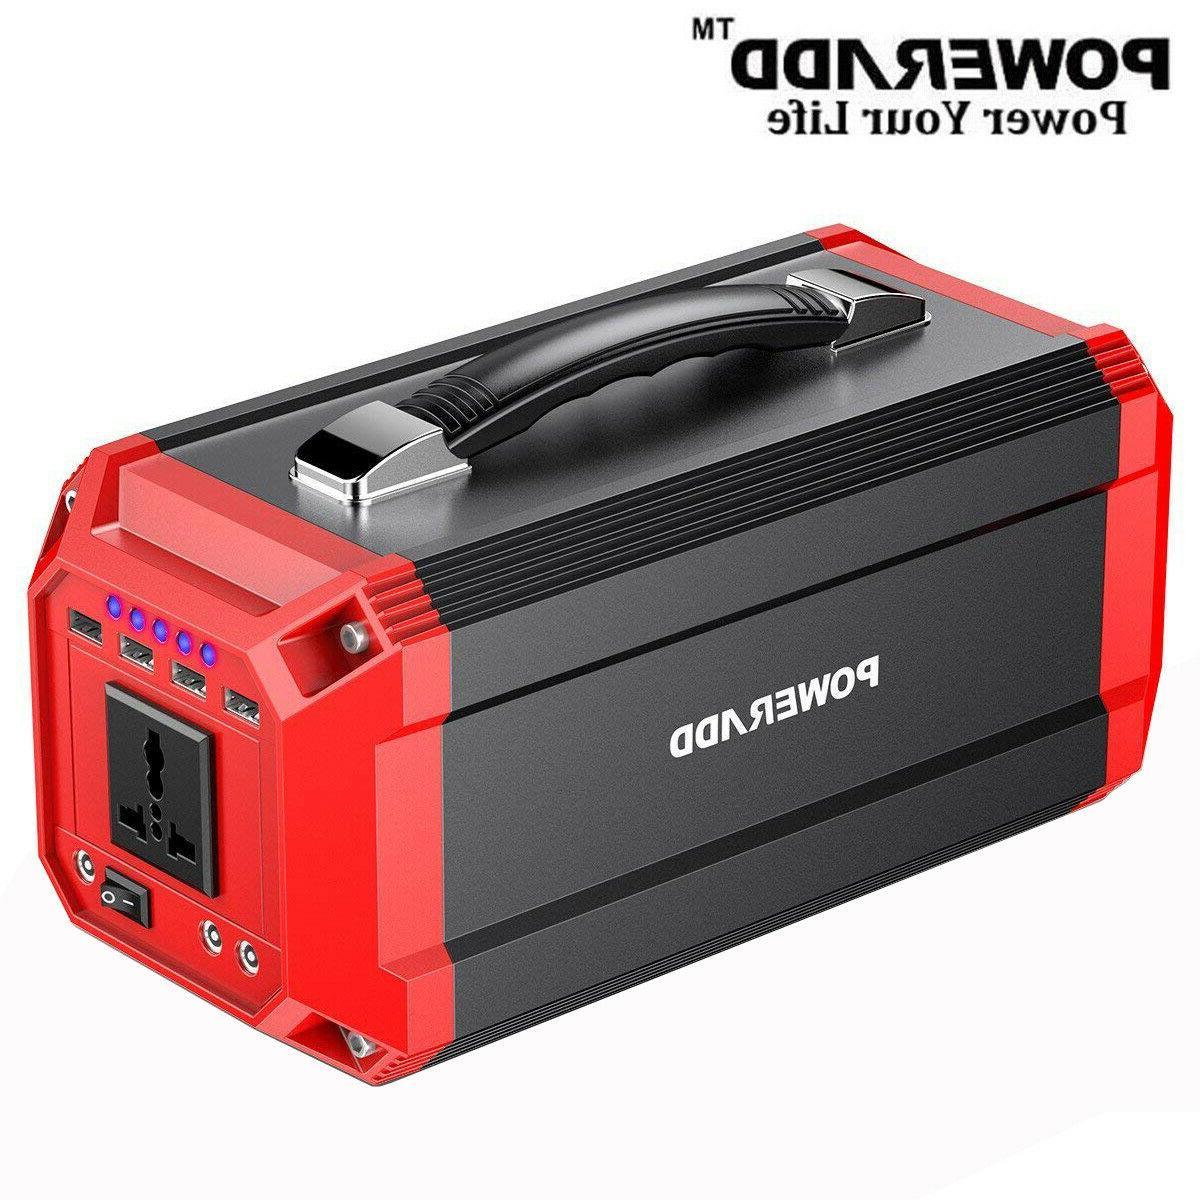 73000mah portable generator power inverter power bank